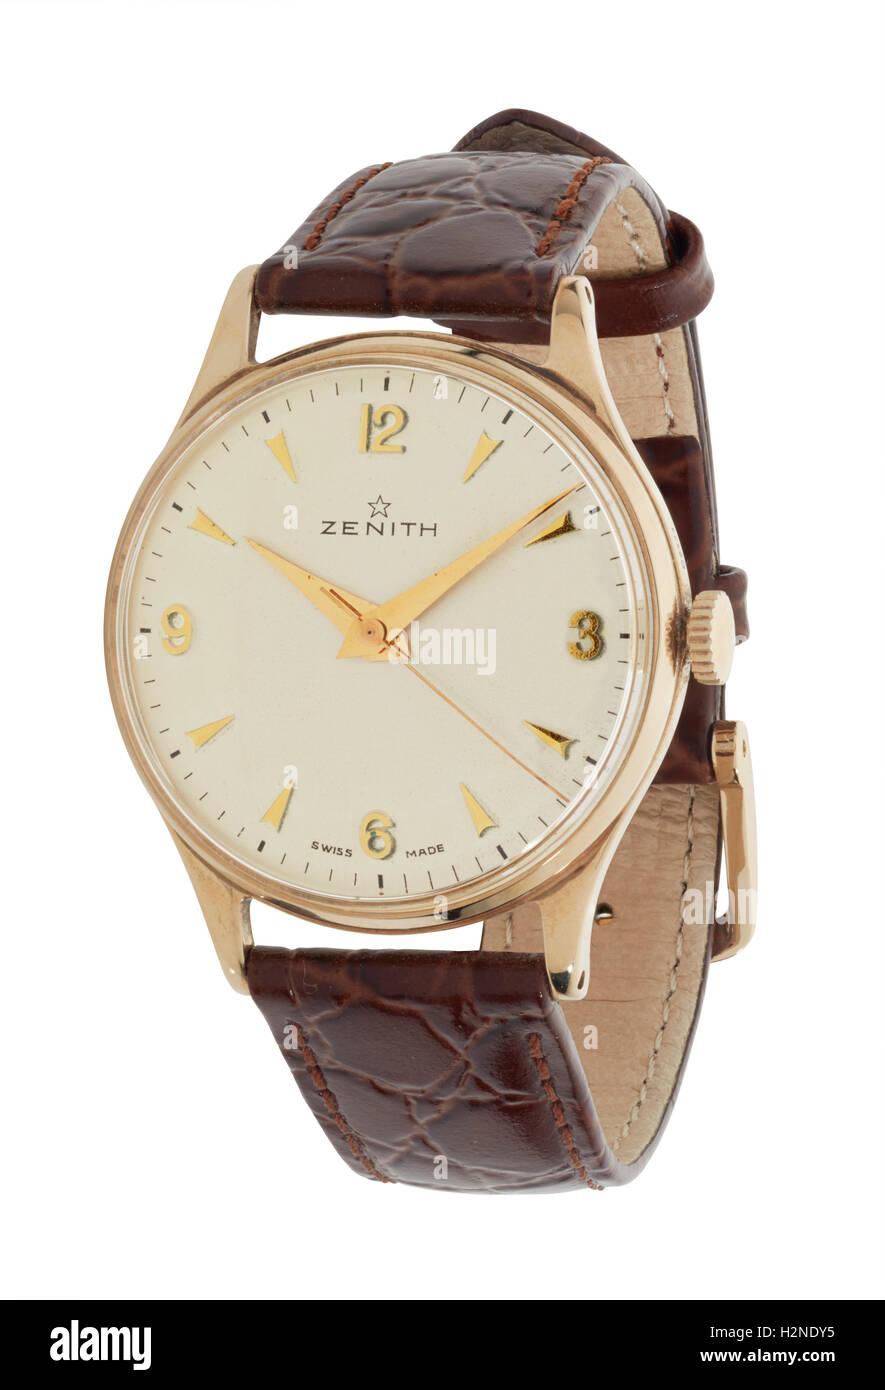 Mans Zenith watch - Stock Image